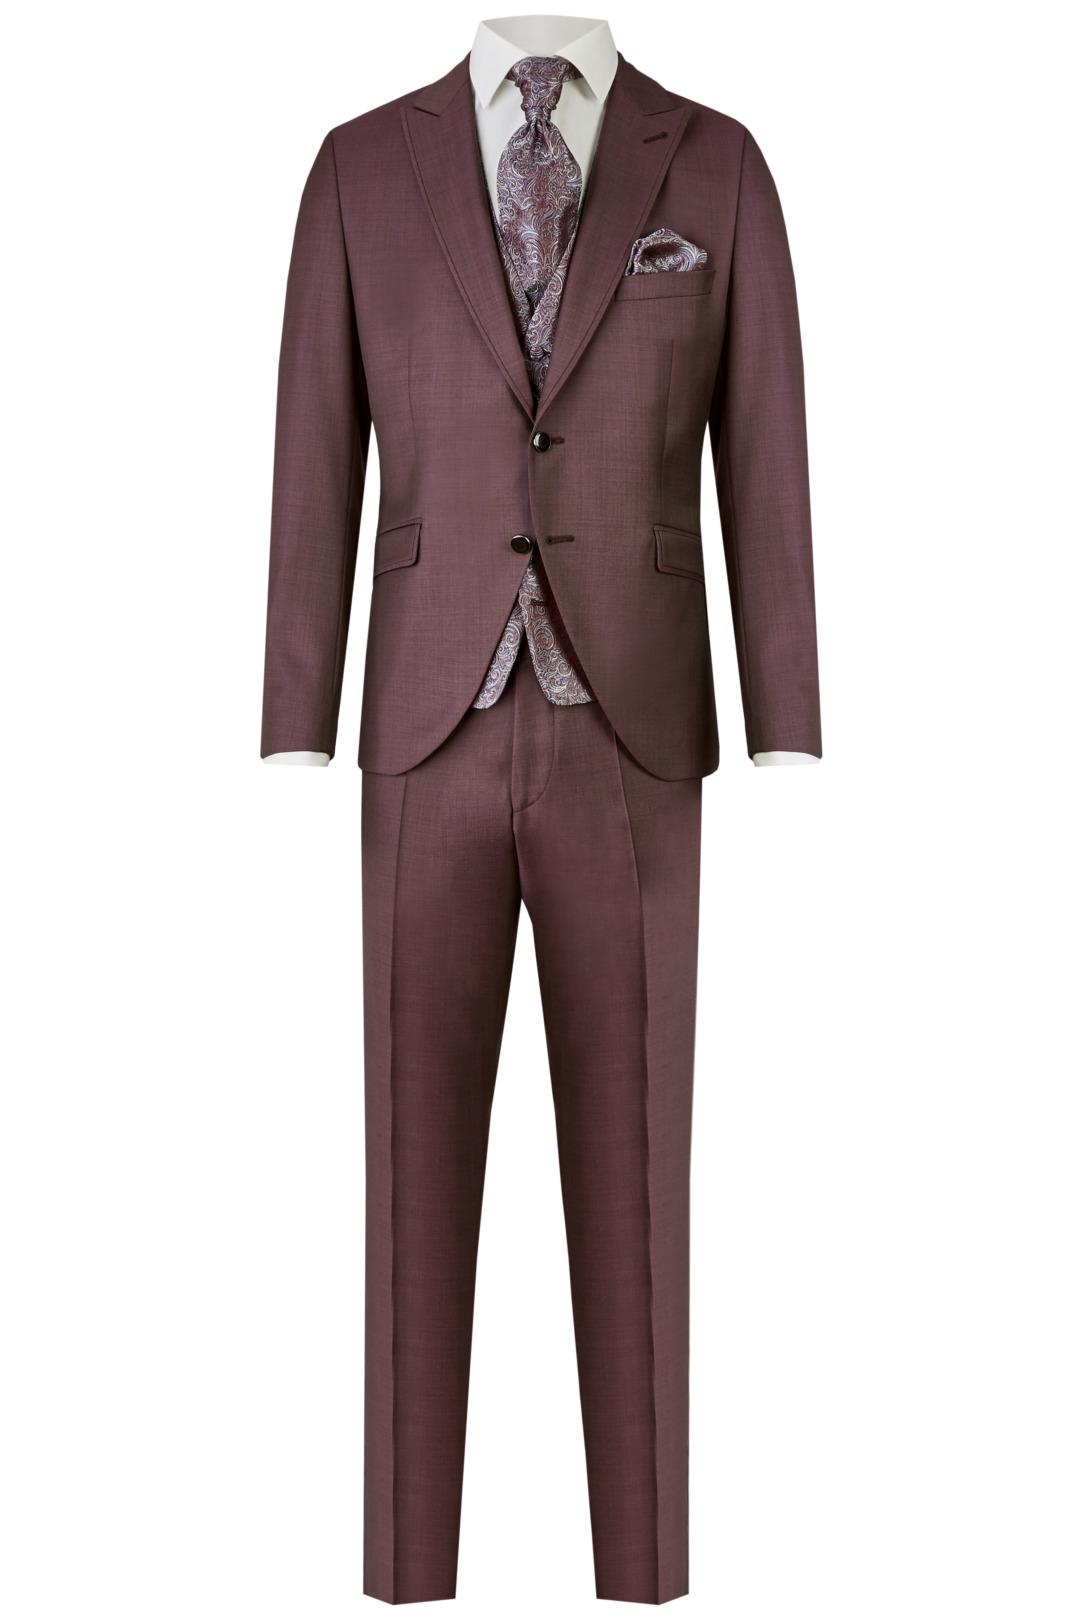 Wilvorst After Six Hochzeitsanzug Männer Mode Bräutigam klassische Form rot bordeaux wil_0121_otf_as-look-3_1